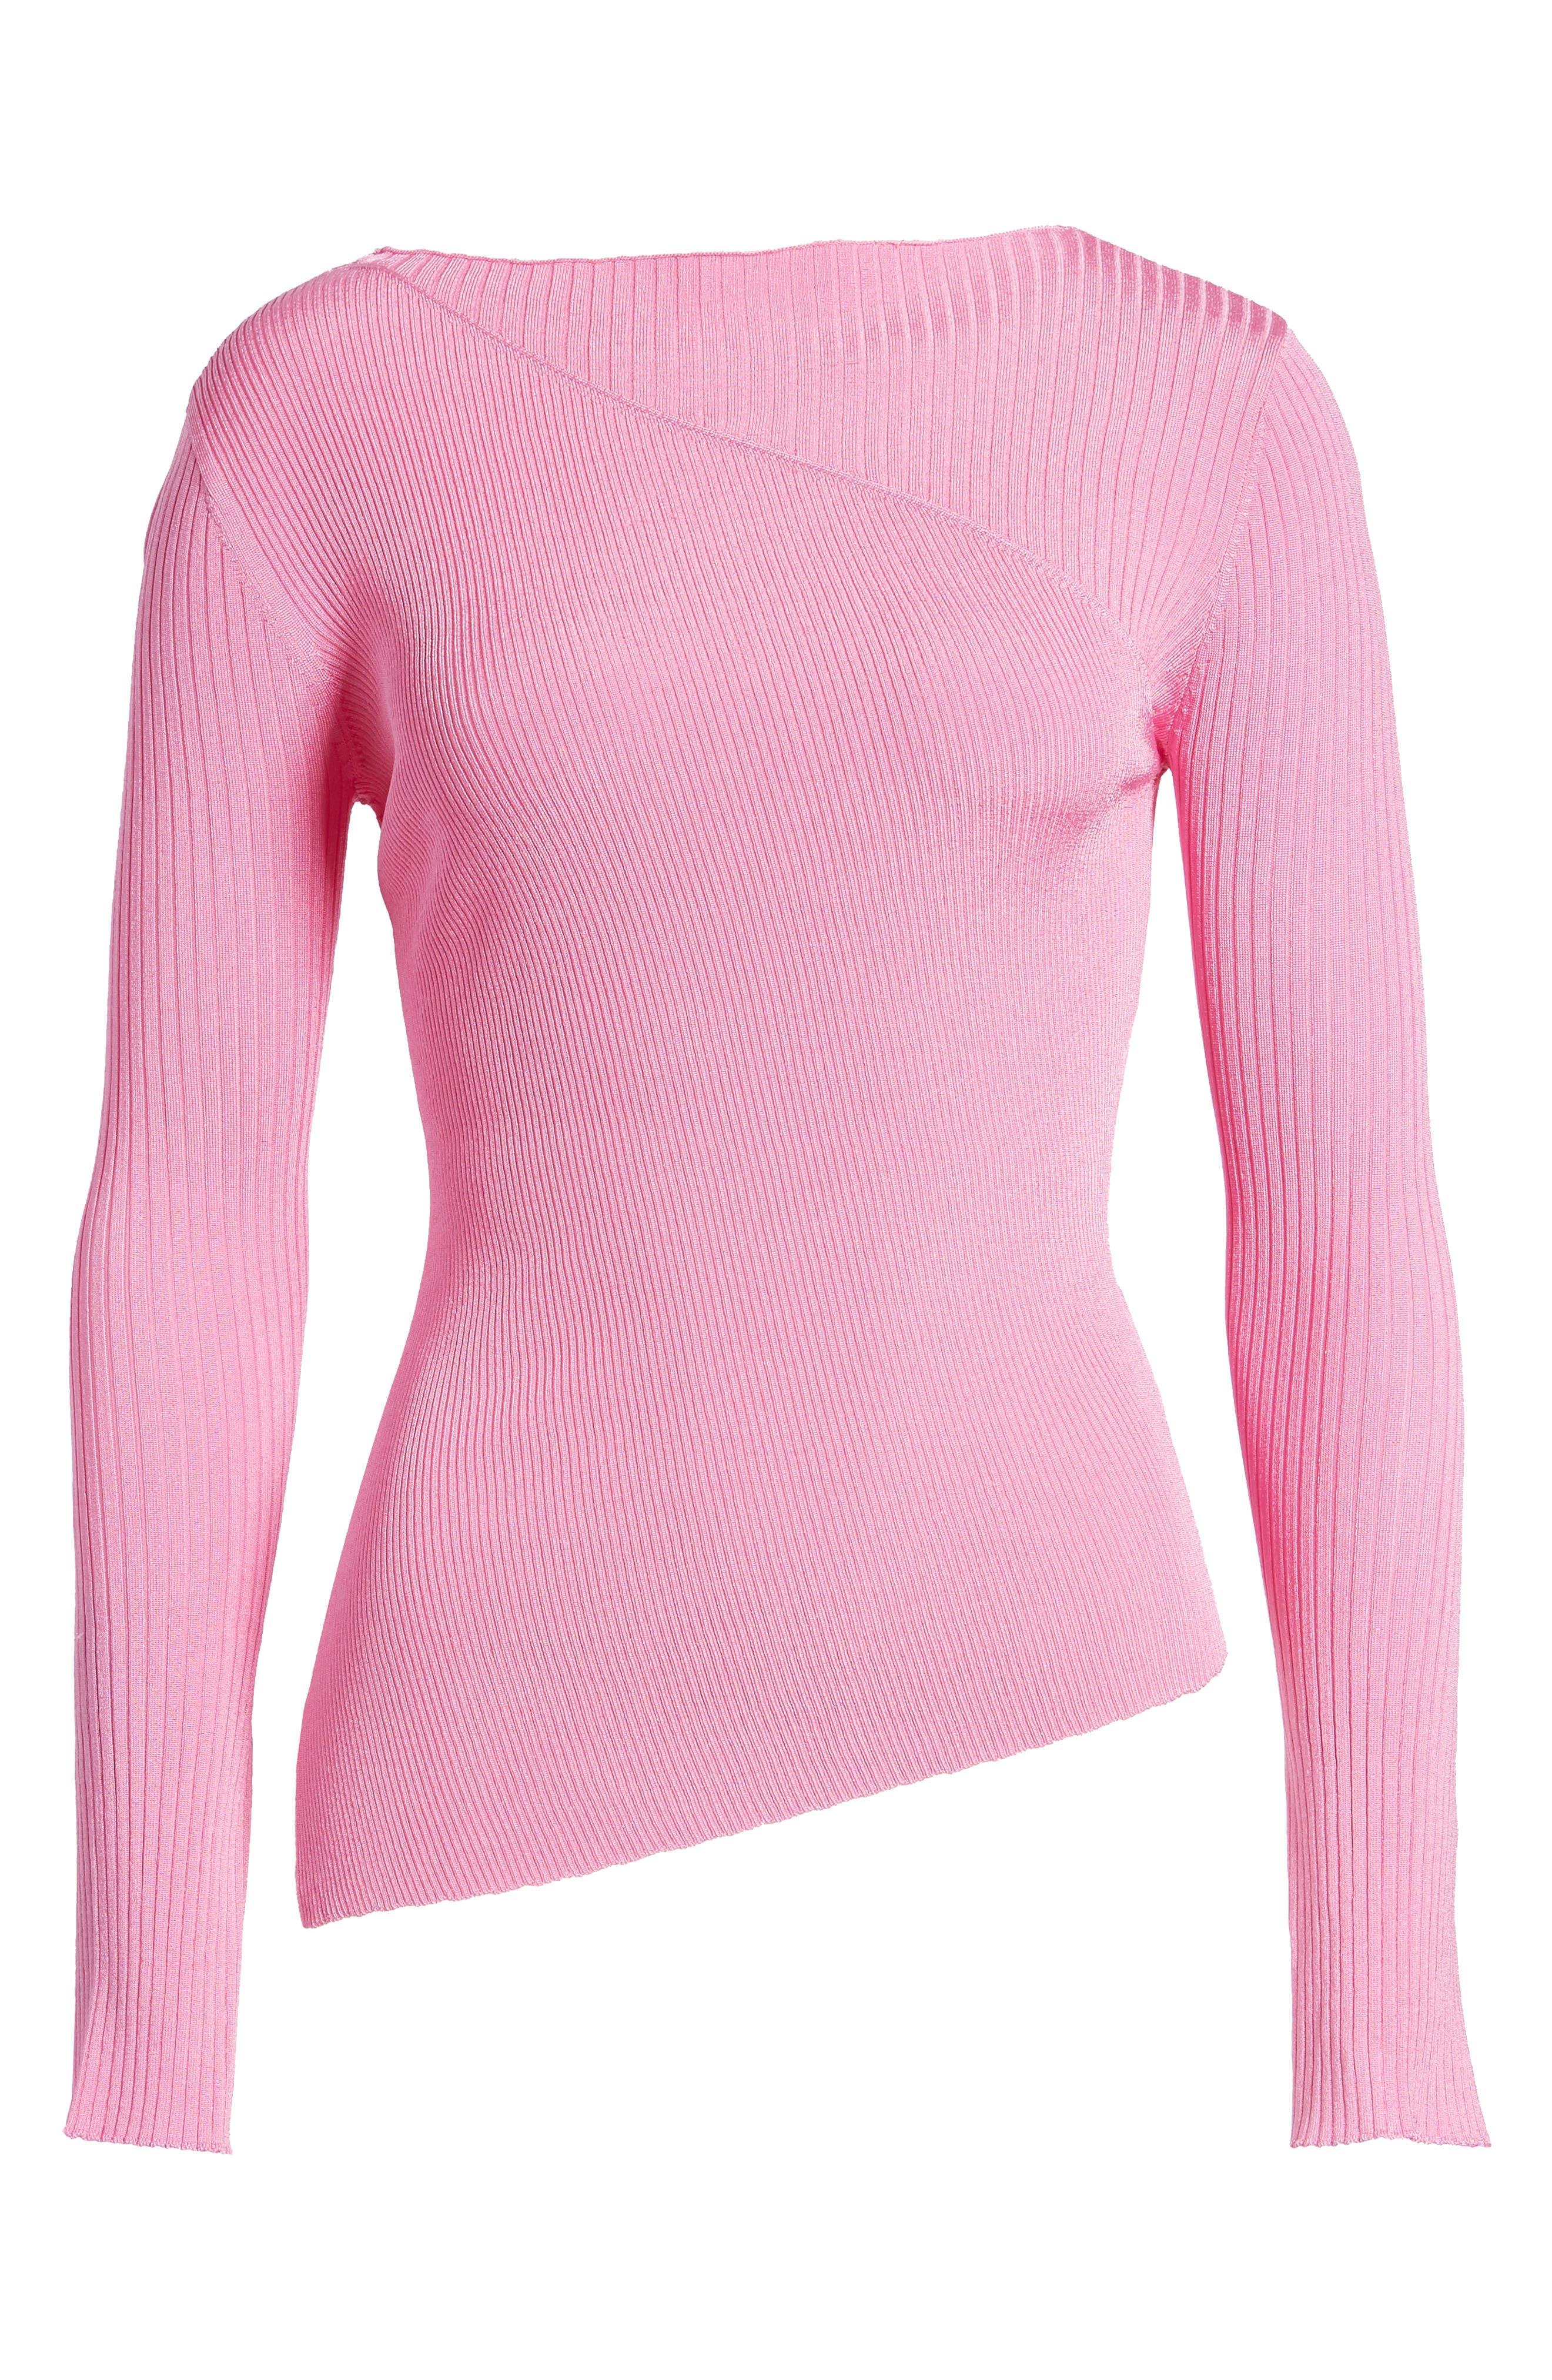 Slash Neck Asymmetrical Top,                         Main,                         color, Pink